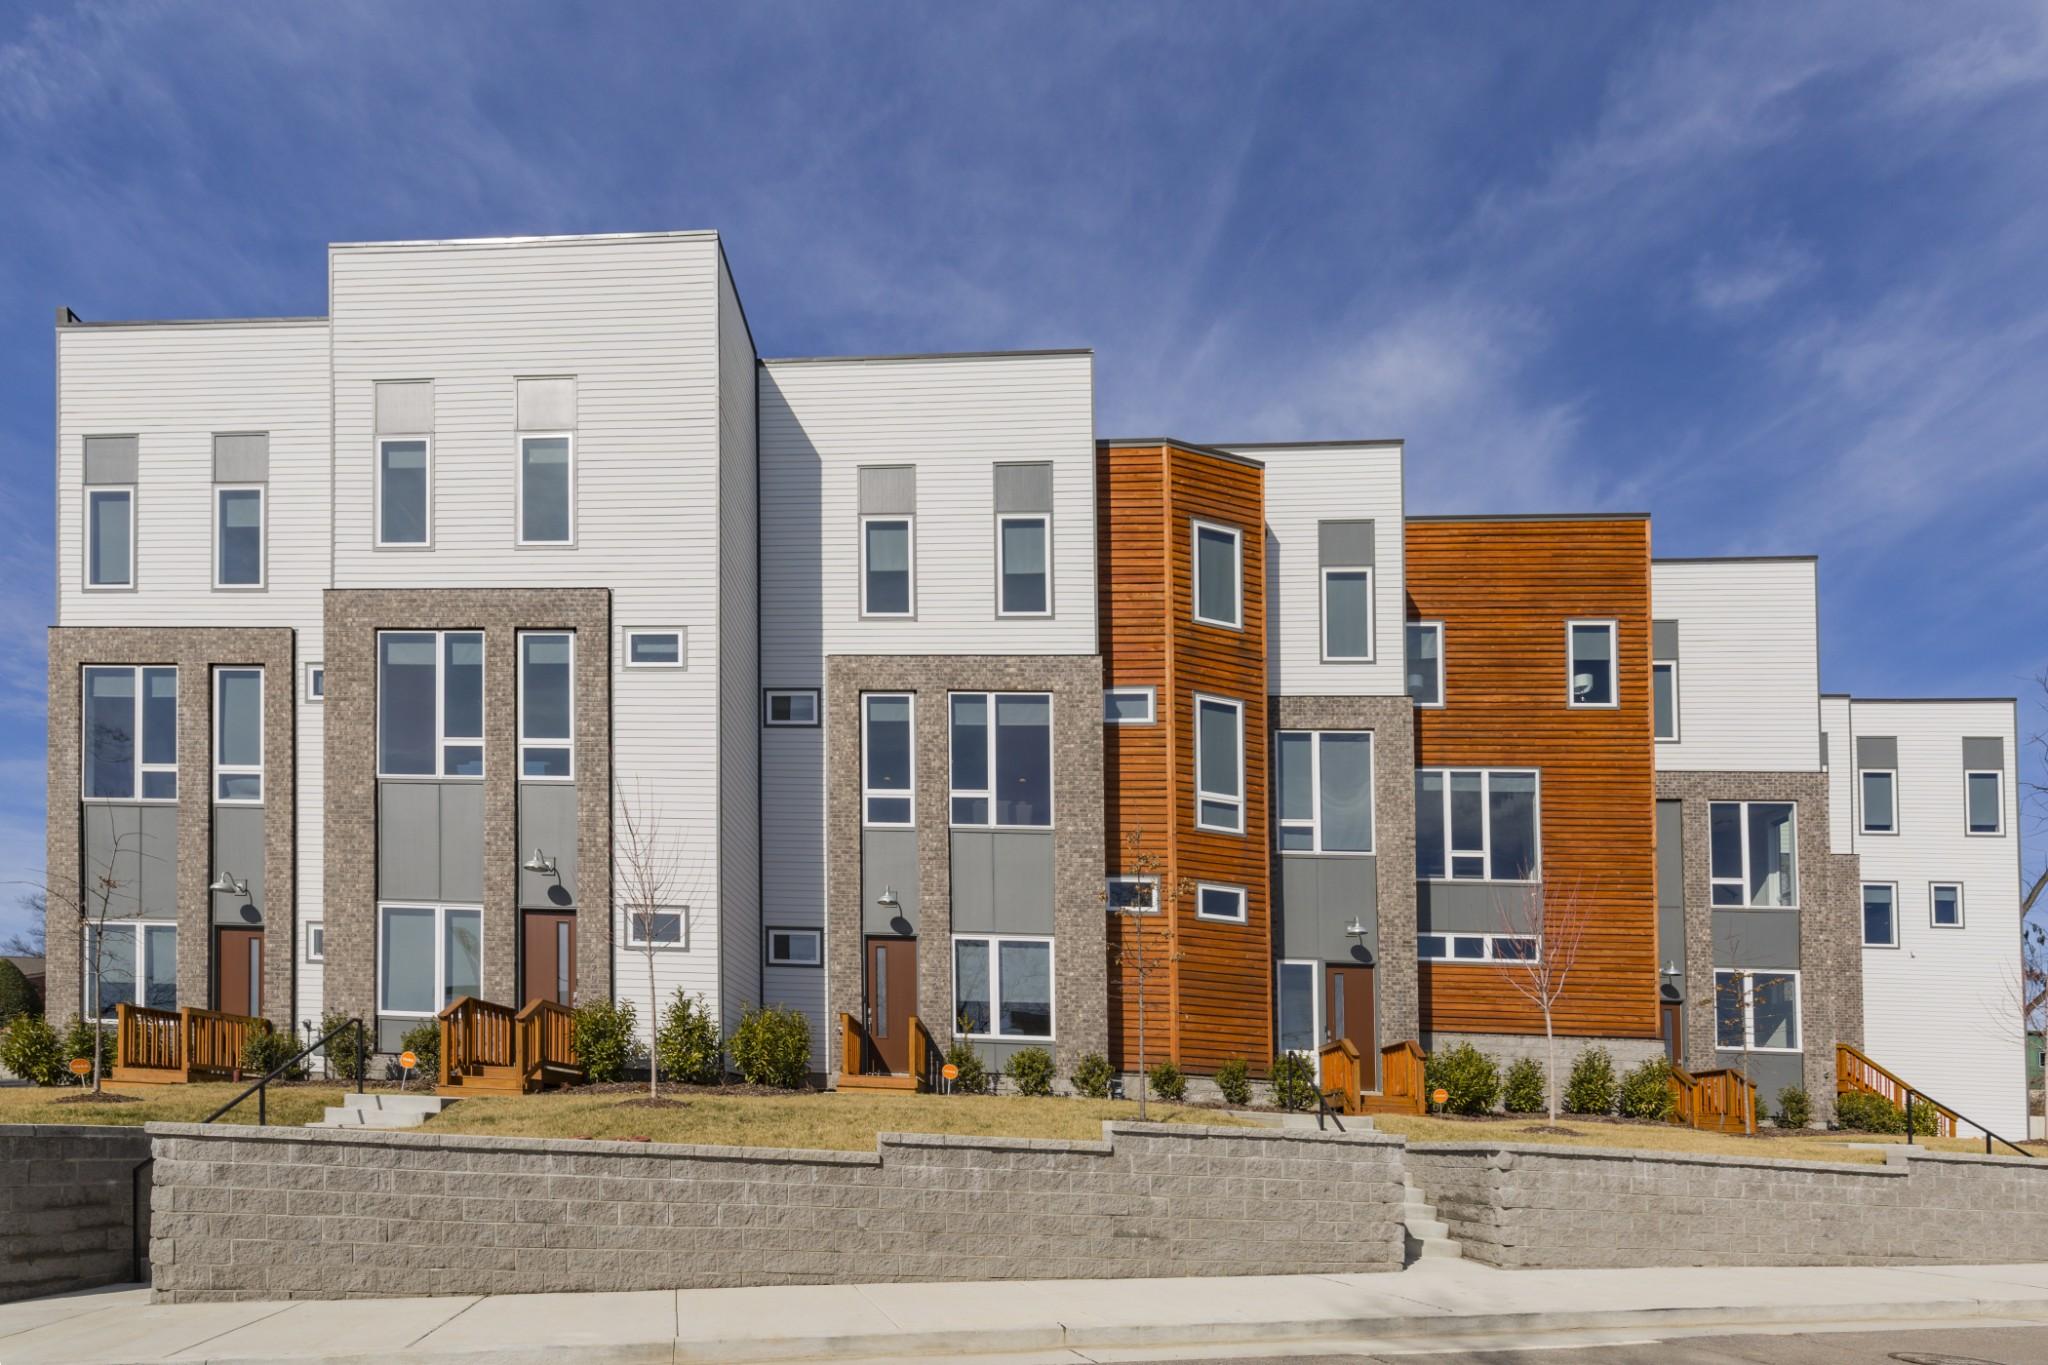 2705 Biloxi Ave Property Photo - Nashville, TN real estate listing